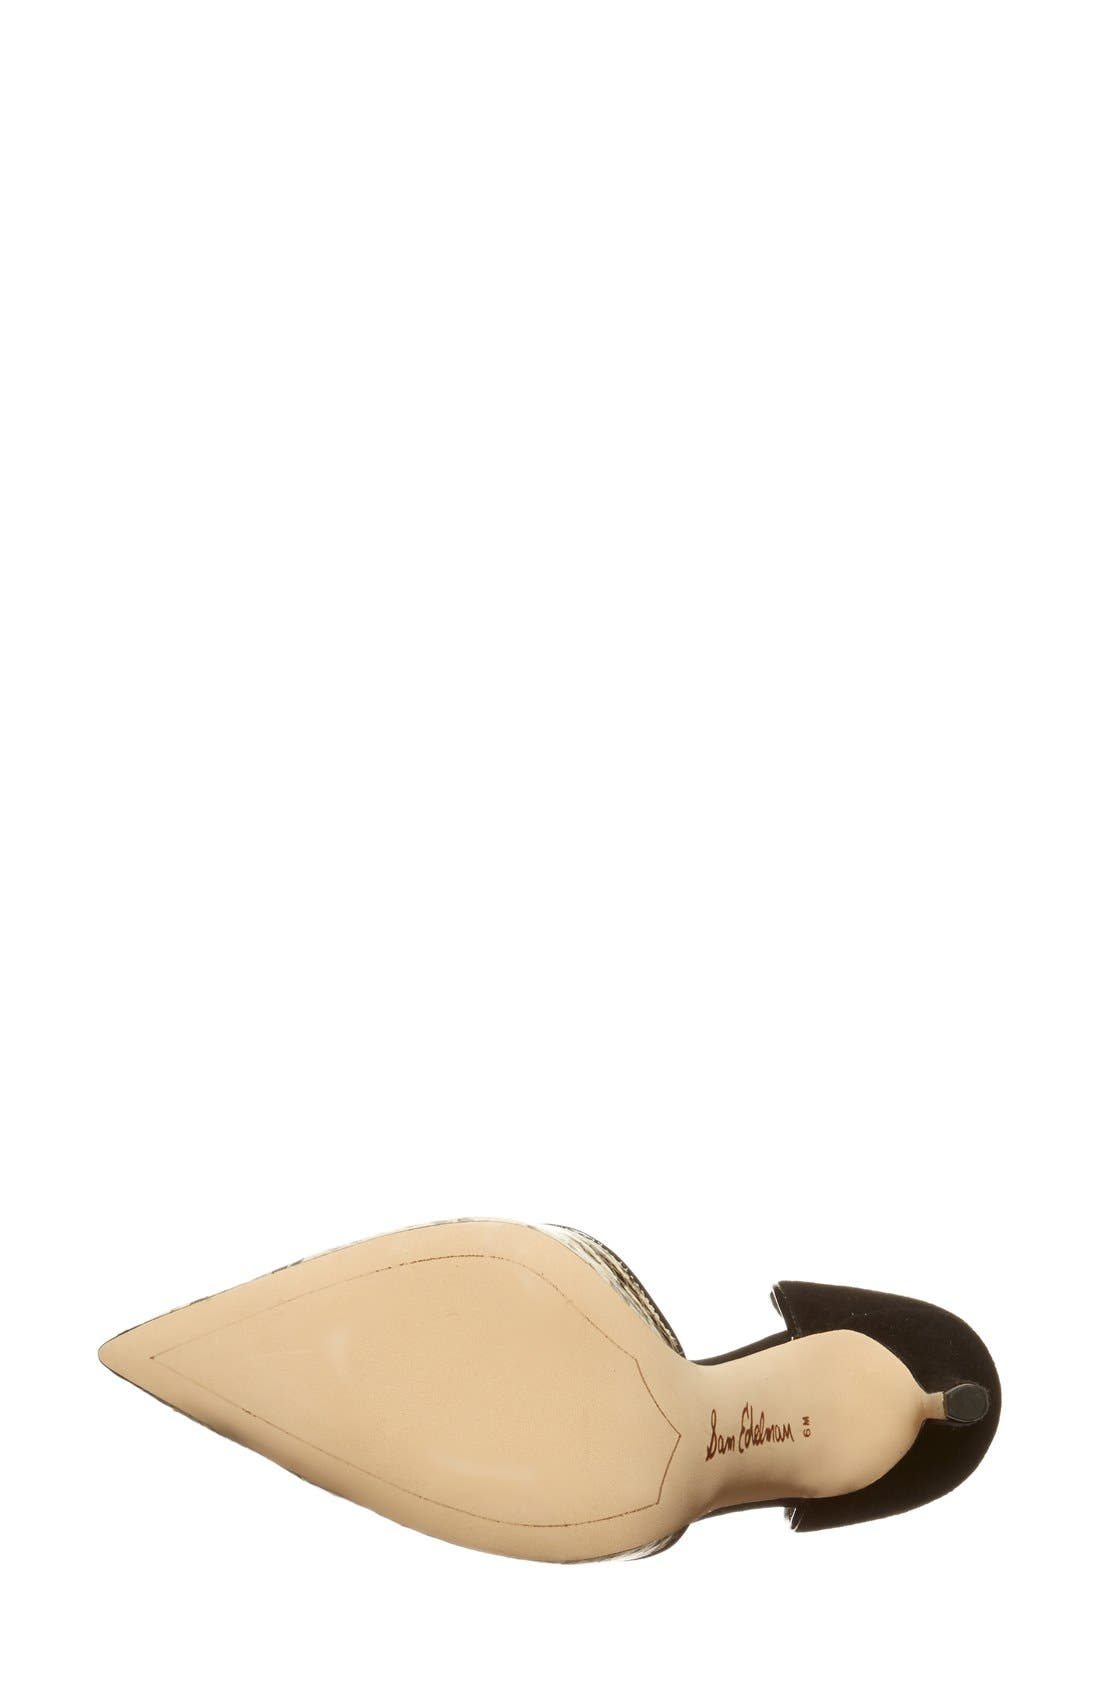 ,                             'Delilah' Calf Hair d'Orsay Pump,                             Alternate thumbnail 38, color,                             100